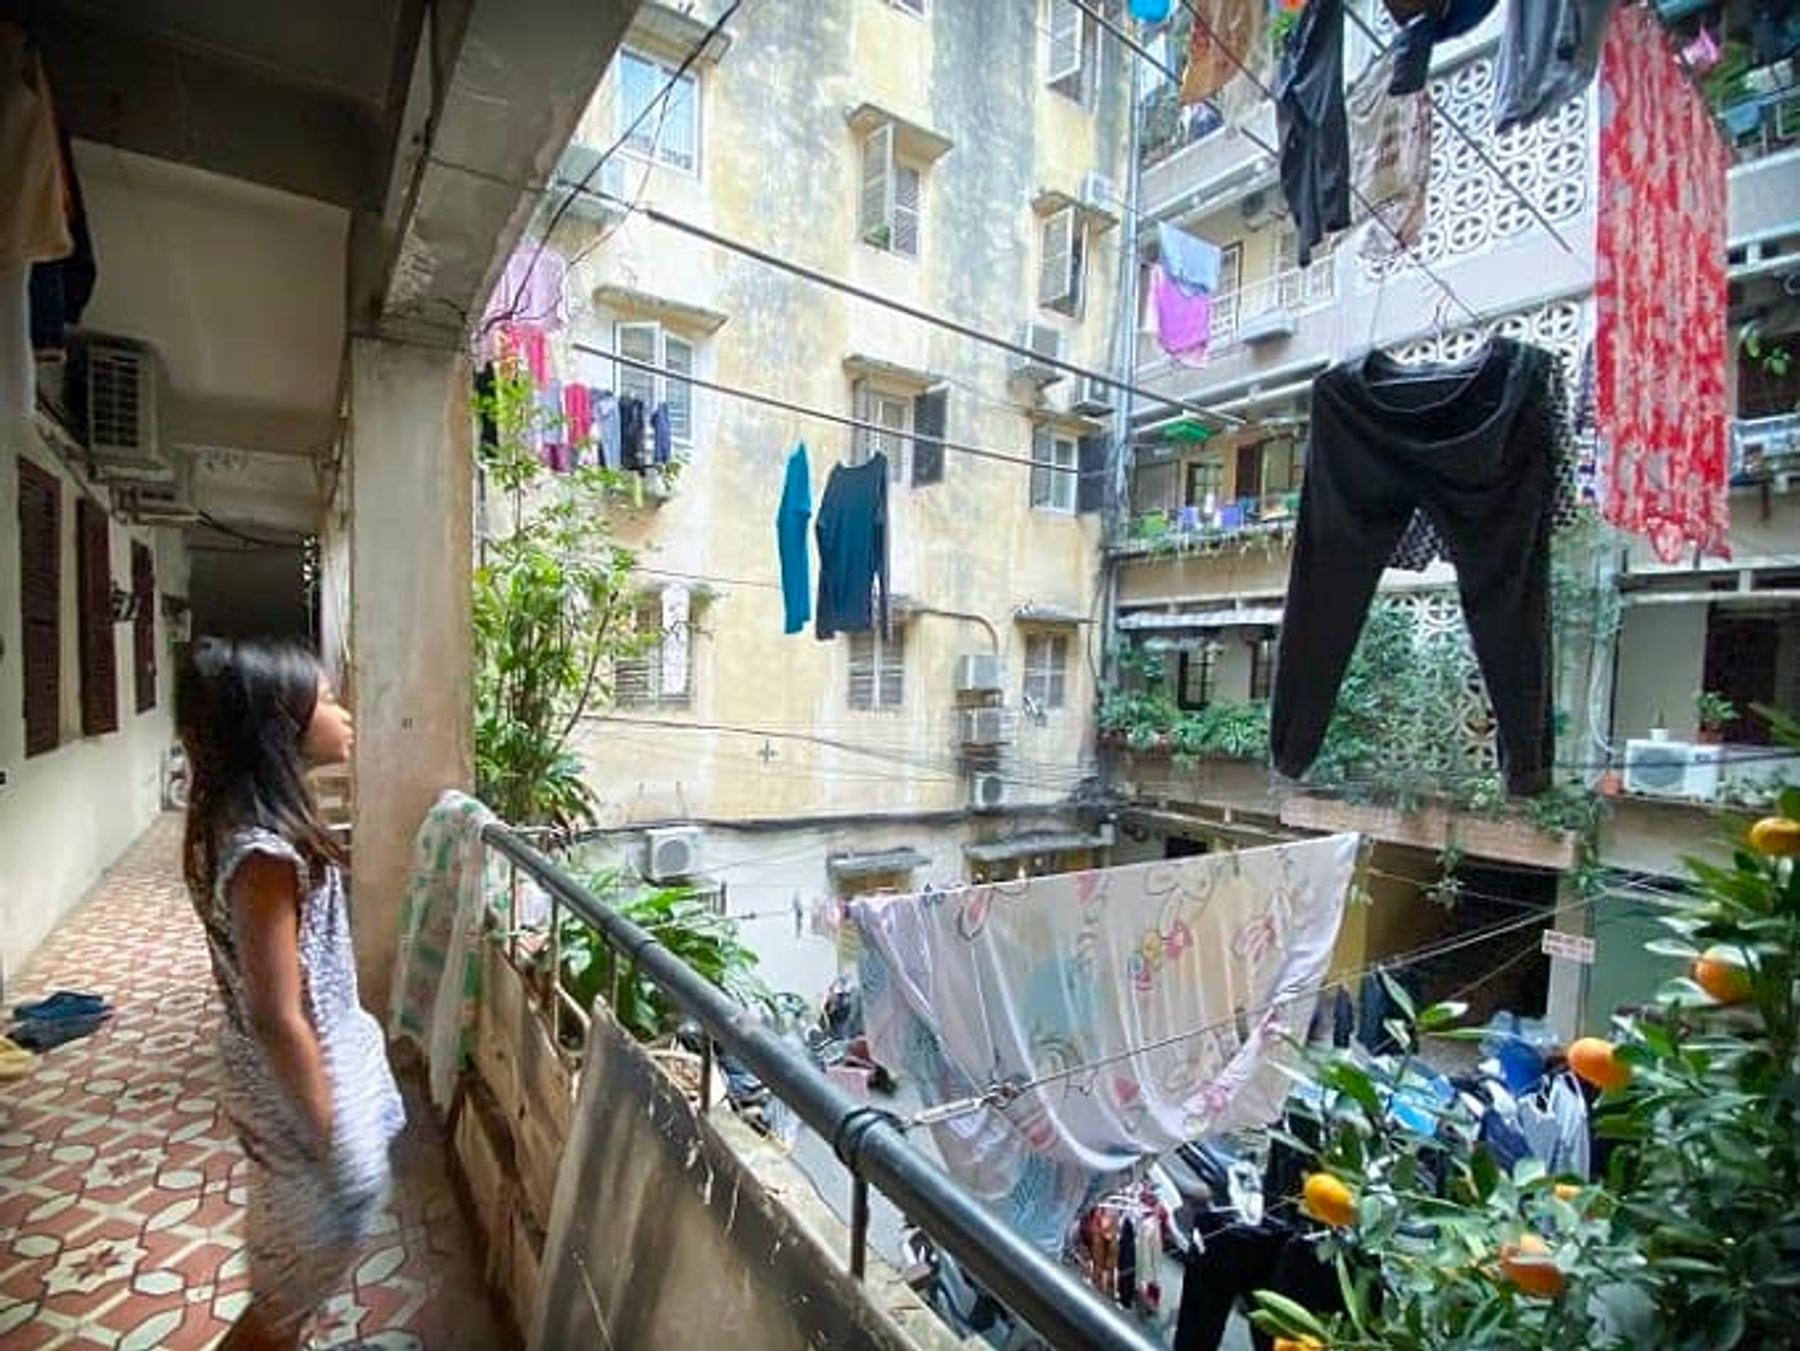 A local apartment building in Hanoi, Vietnam (March 2020)